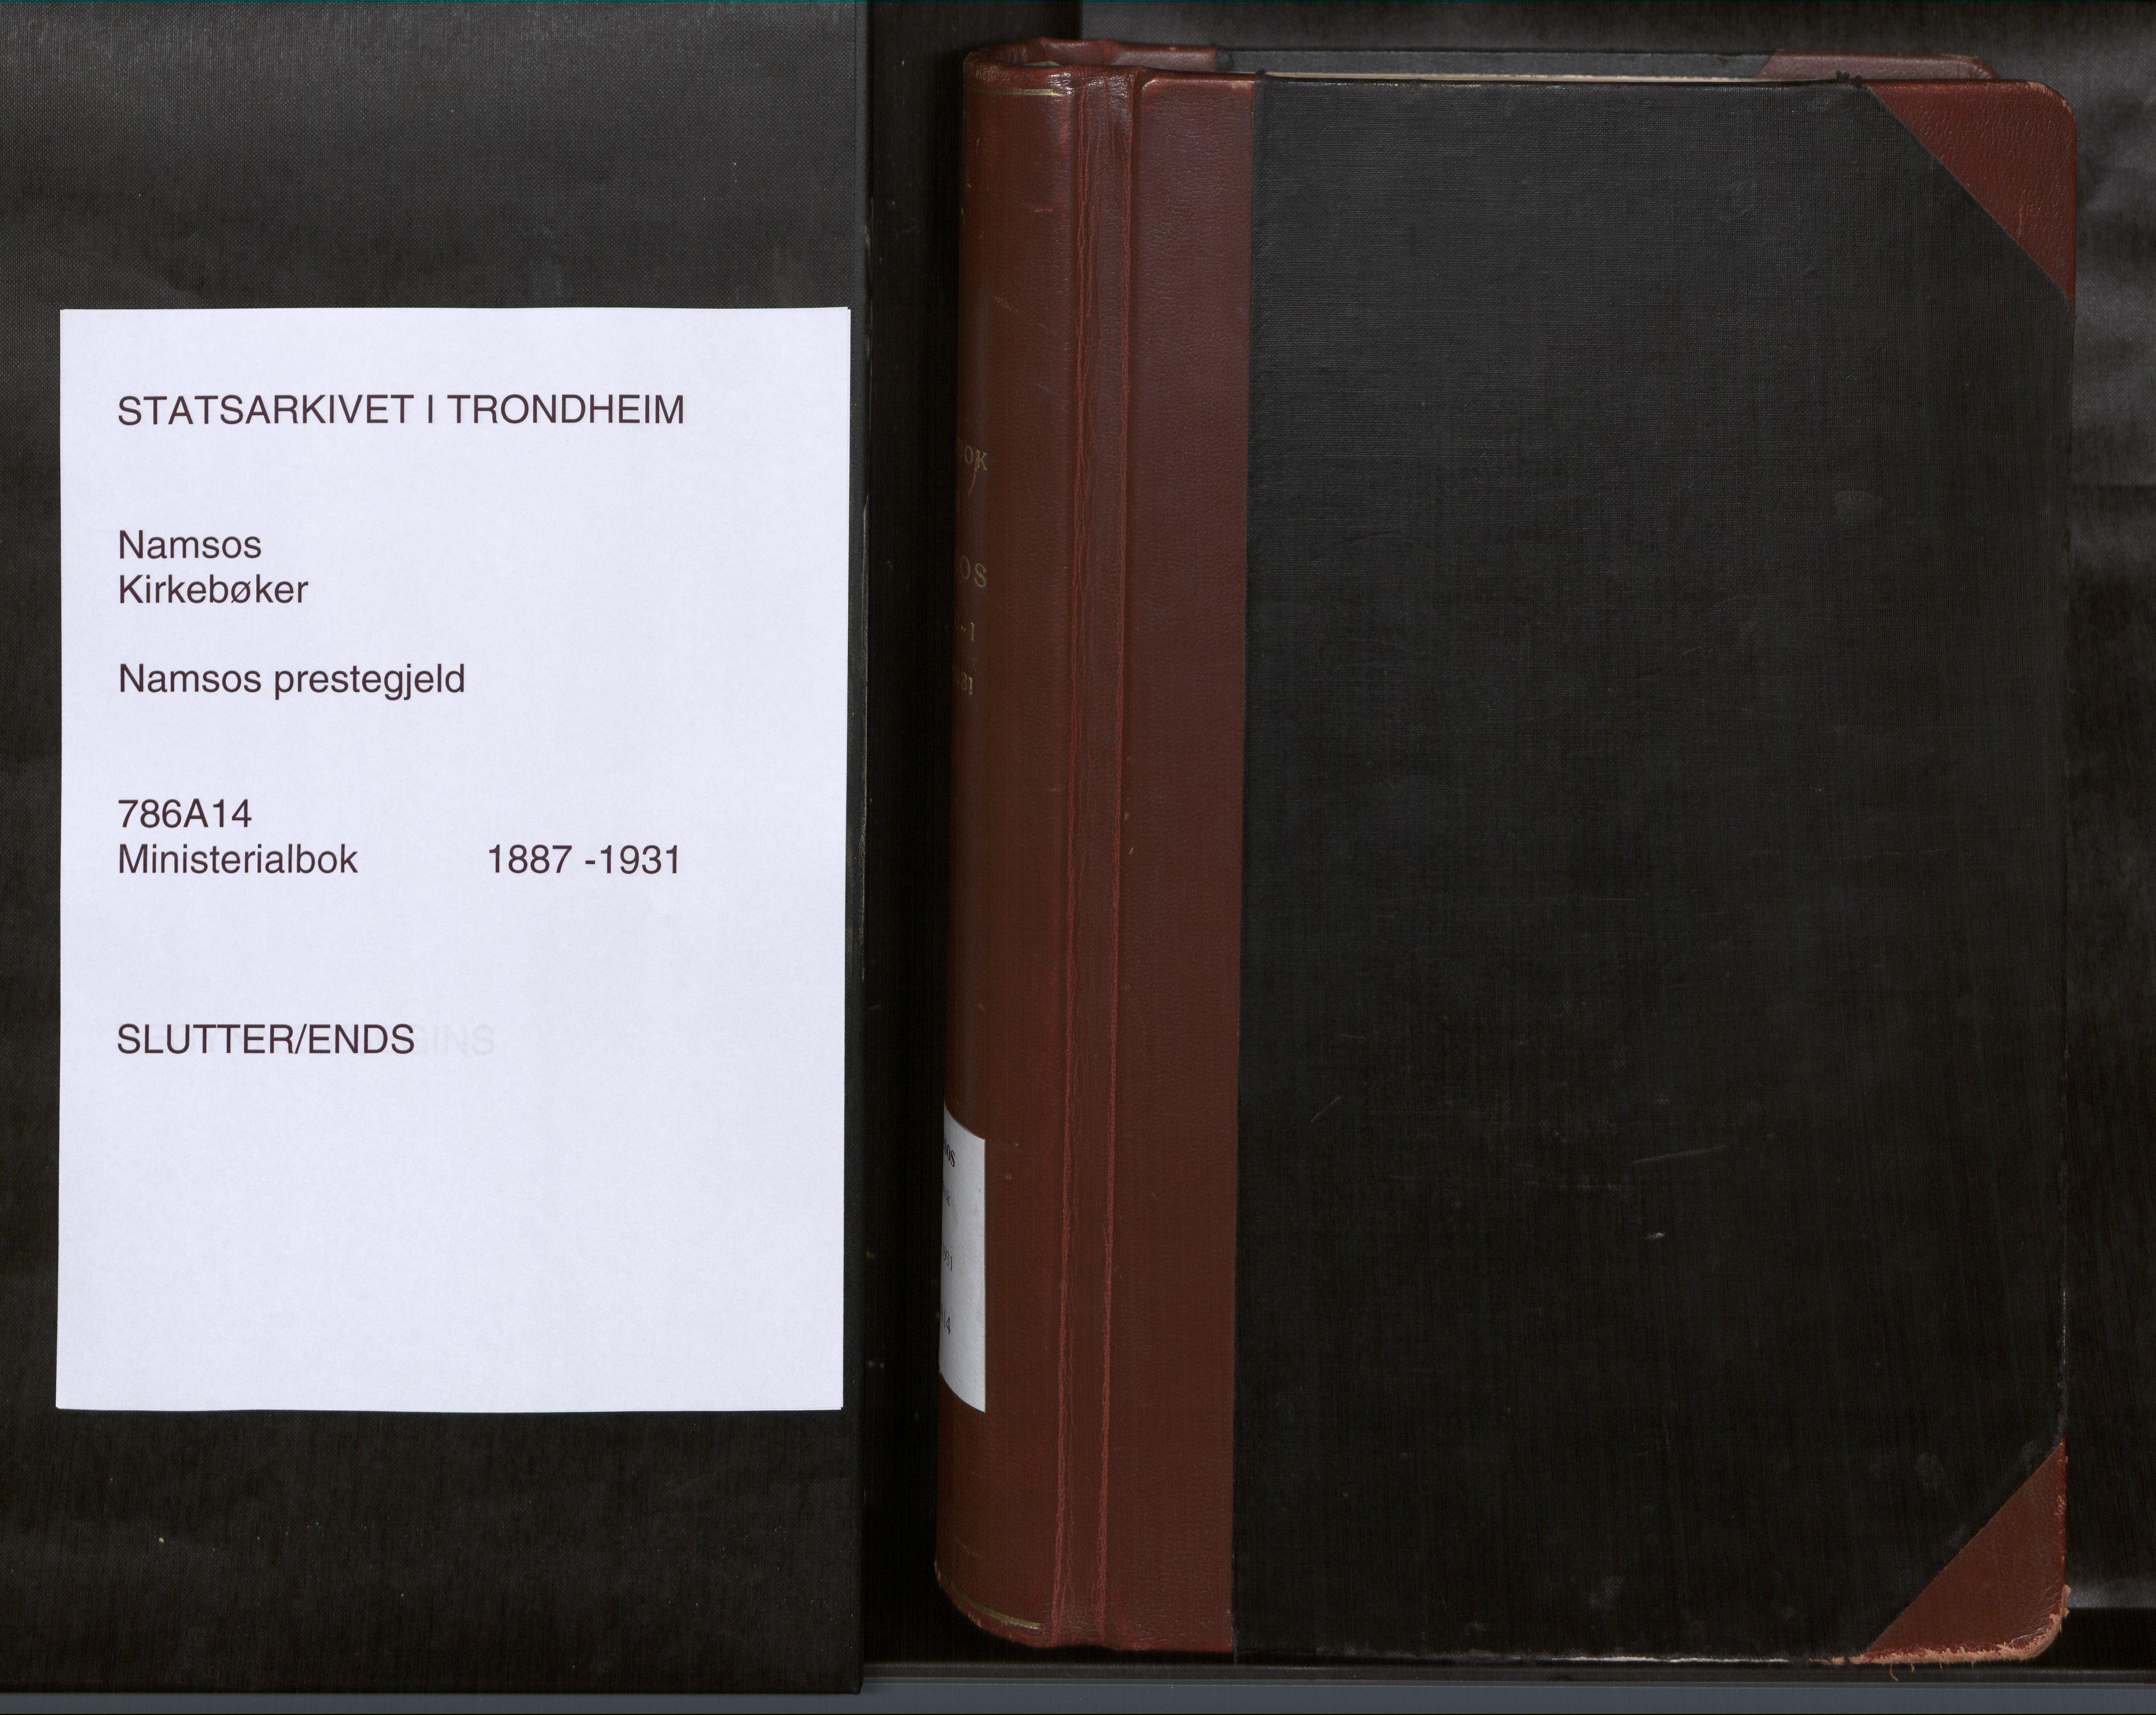 SAT, Ministerialprotokoller, klokkerbøker og fødselsregistre - Nord-Trøndelag, 768/L0579a: Ministerialbok nr. 768A14, 1887-1931